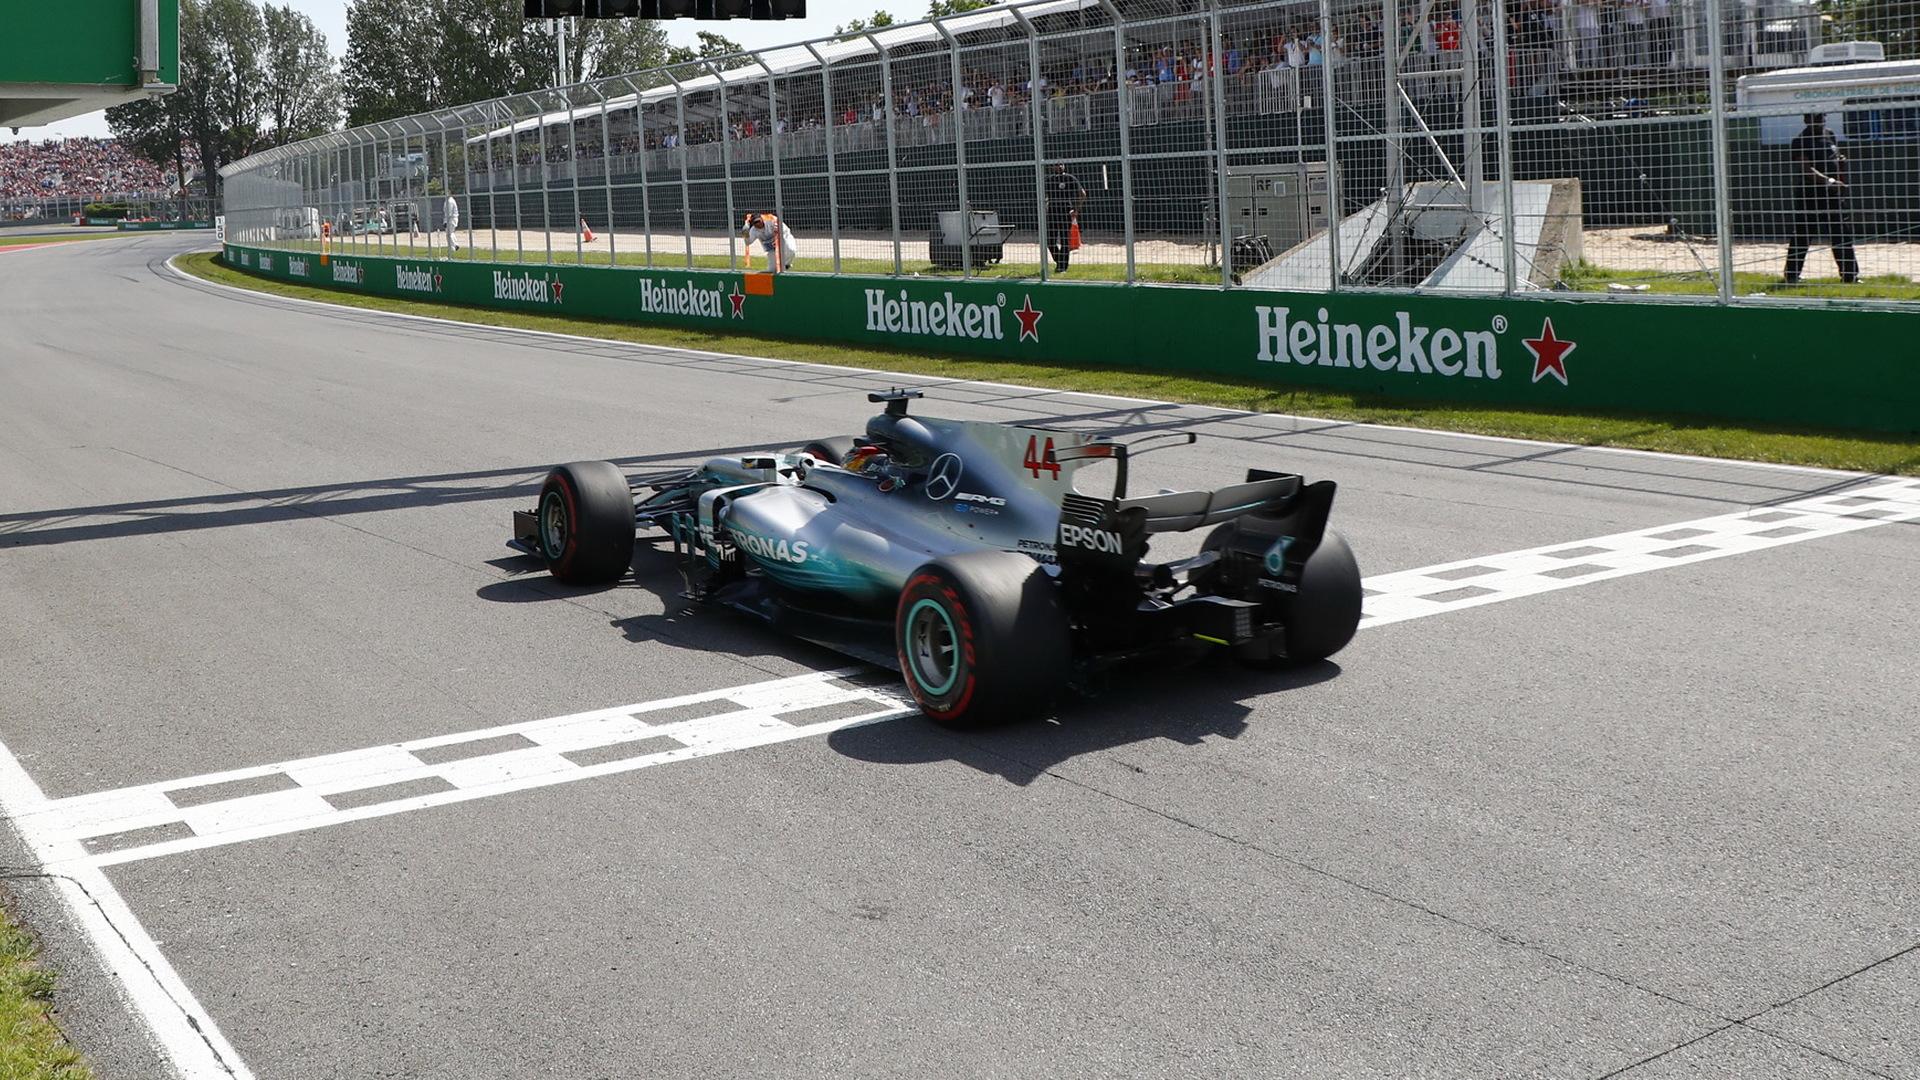 Mercedes AMG's Lewis Hamilton at the 2017 Formula One Canadian Grand Prix